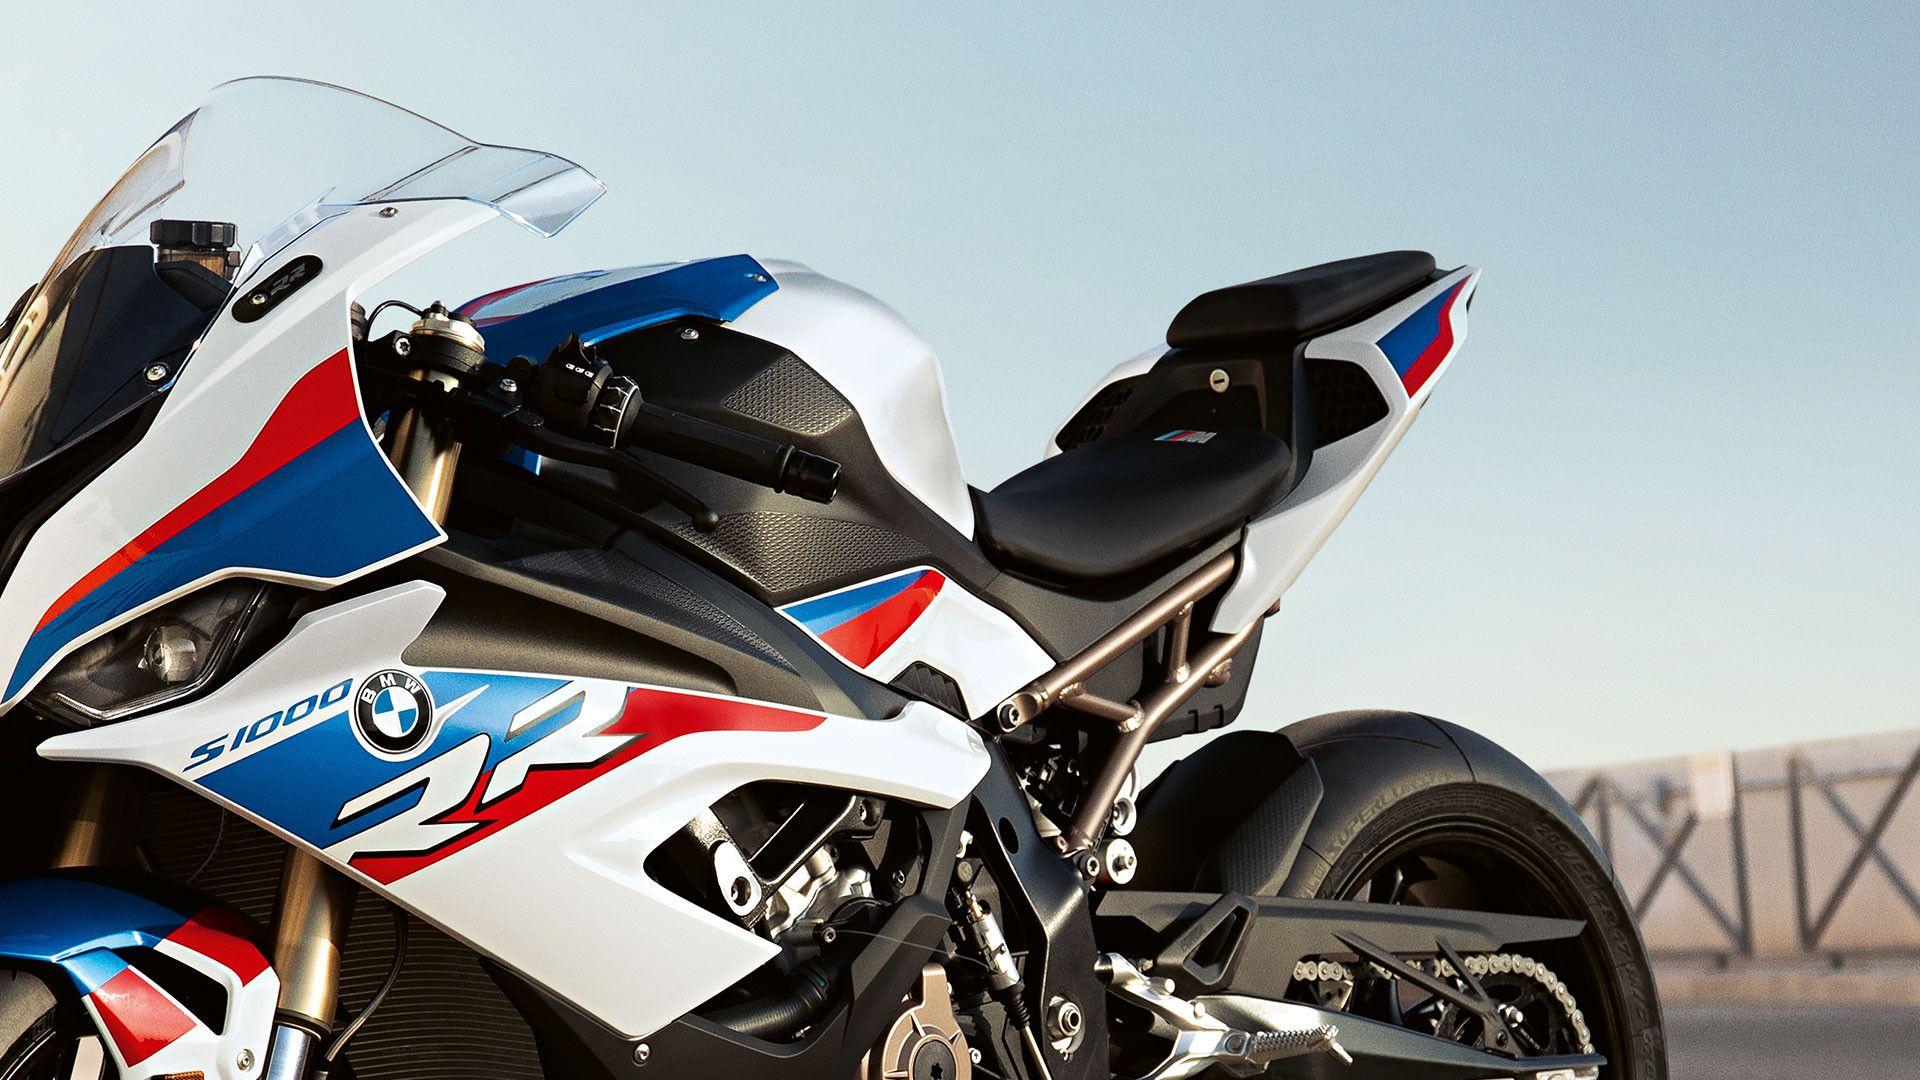 2020 Bmw S1000rr Price Release Date In 2020 Bmw S1000rr Bmw Bmw Motorrad